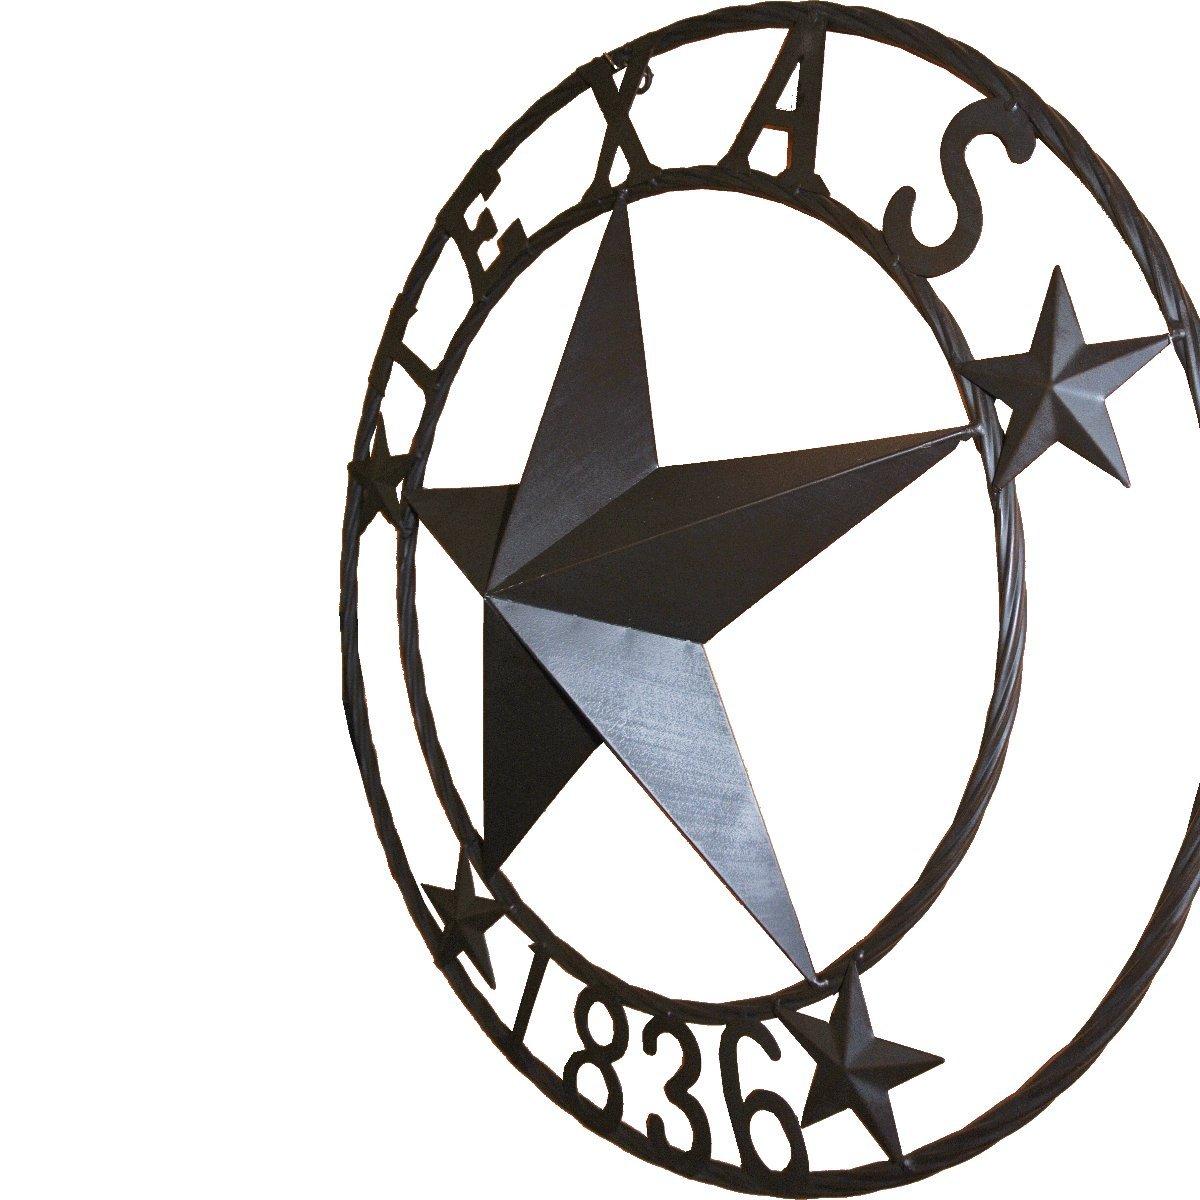 LL Home 21683 Texas 1836 Metal Star